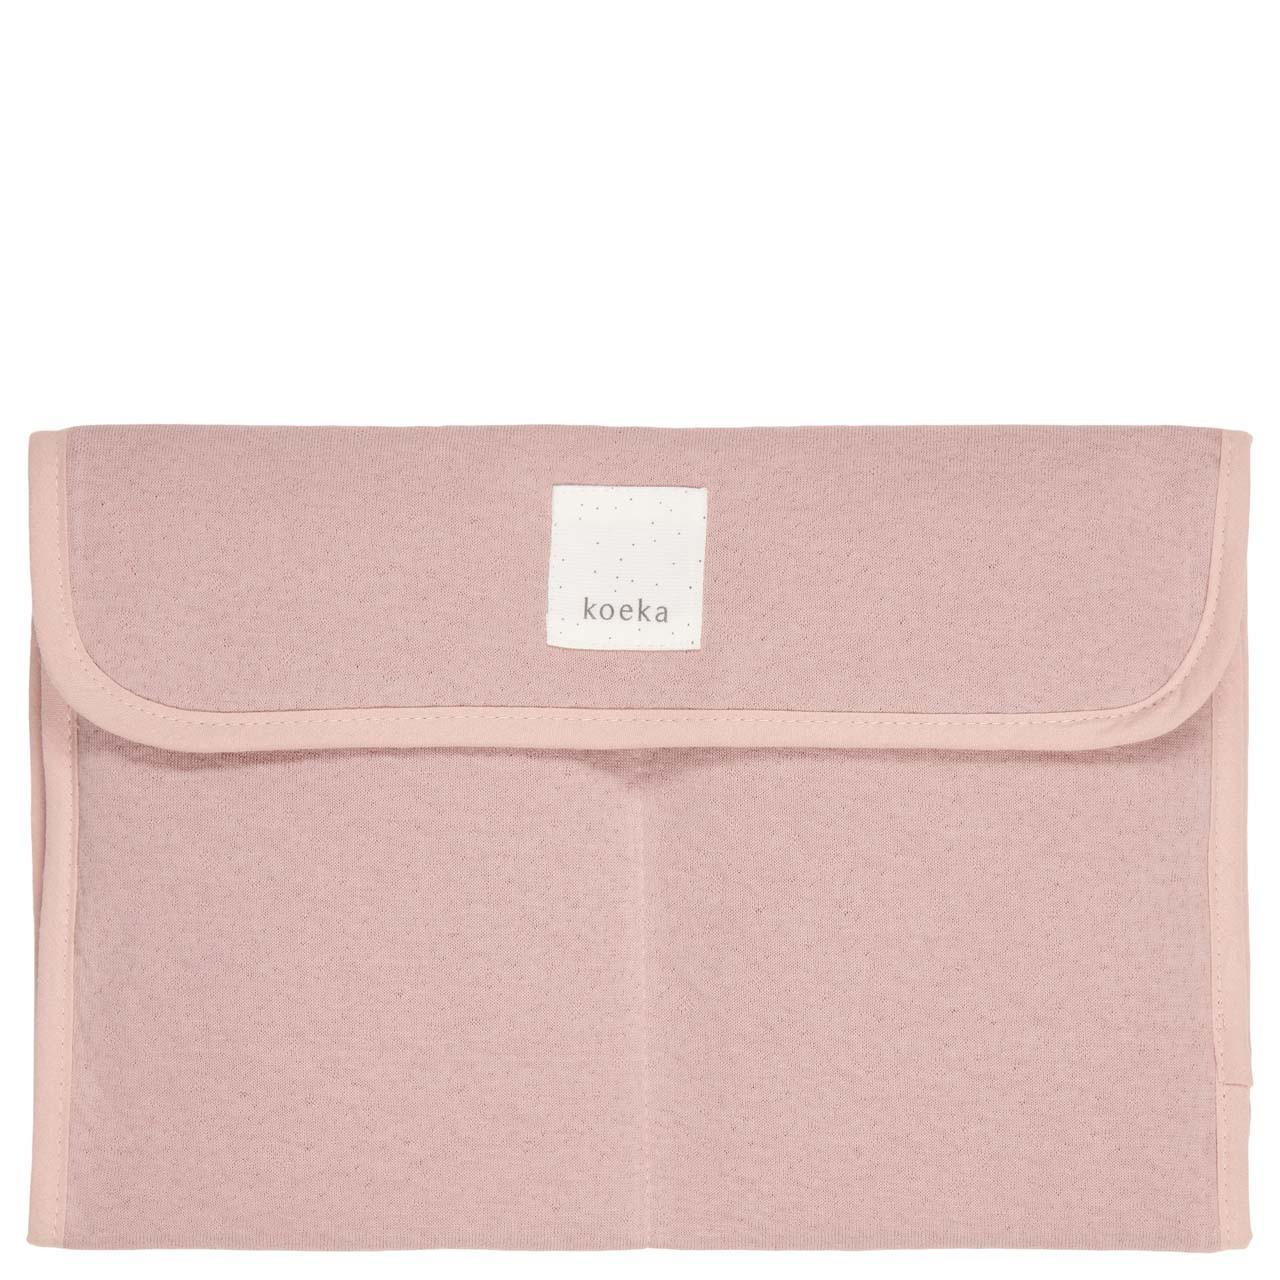 Koeka - Luier Etui Runa Old Pink